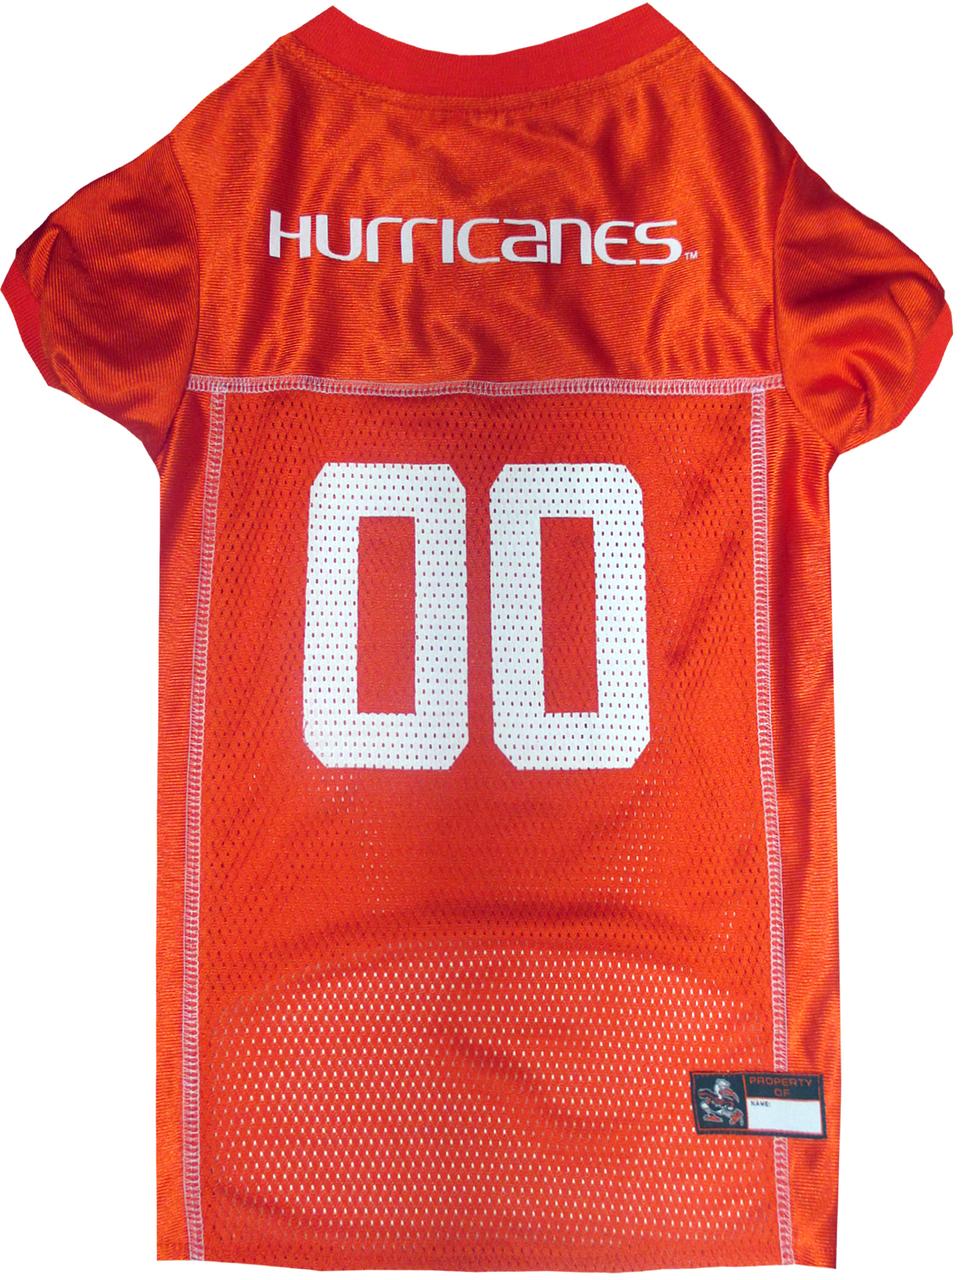 Hot Dog Miami University Football Dog Jersey